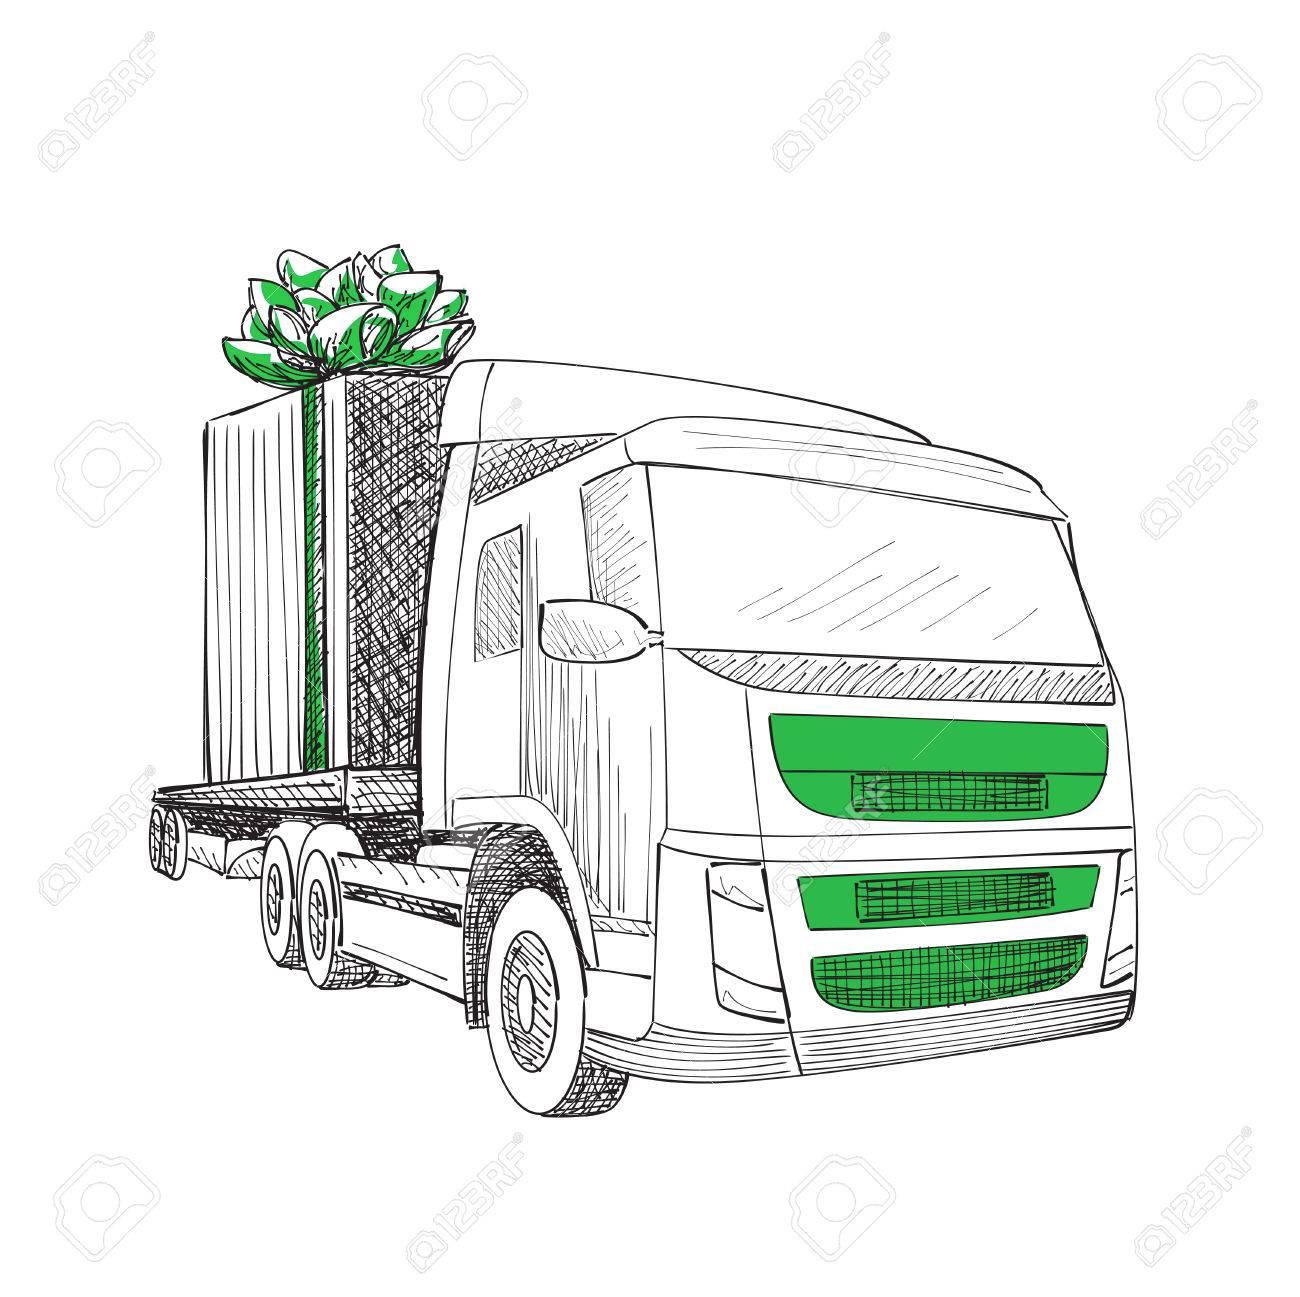 Truck van christmas gift box bow ribbon delivery service van truck van christmas gift box bow ribbon delivery service van new year greeting card m4hsunfo